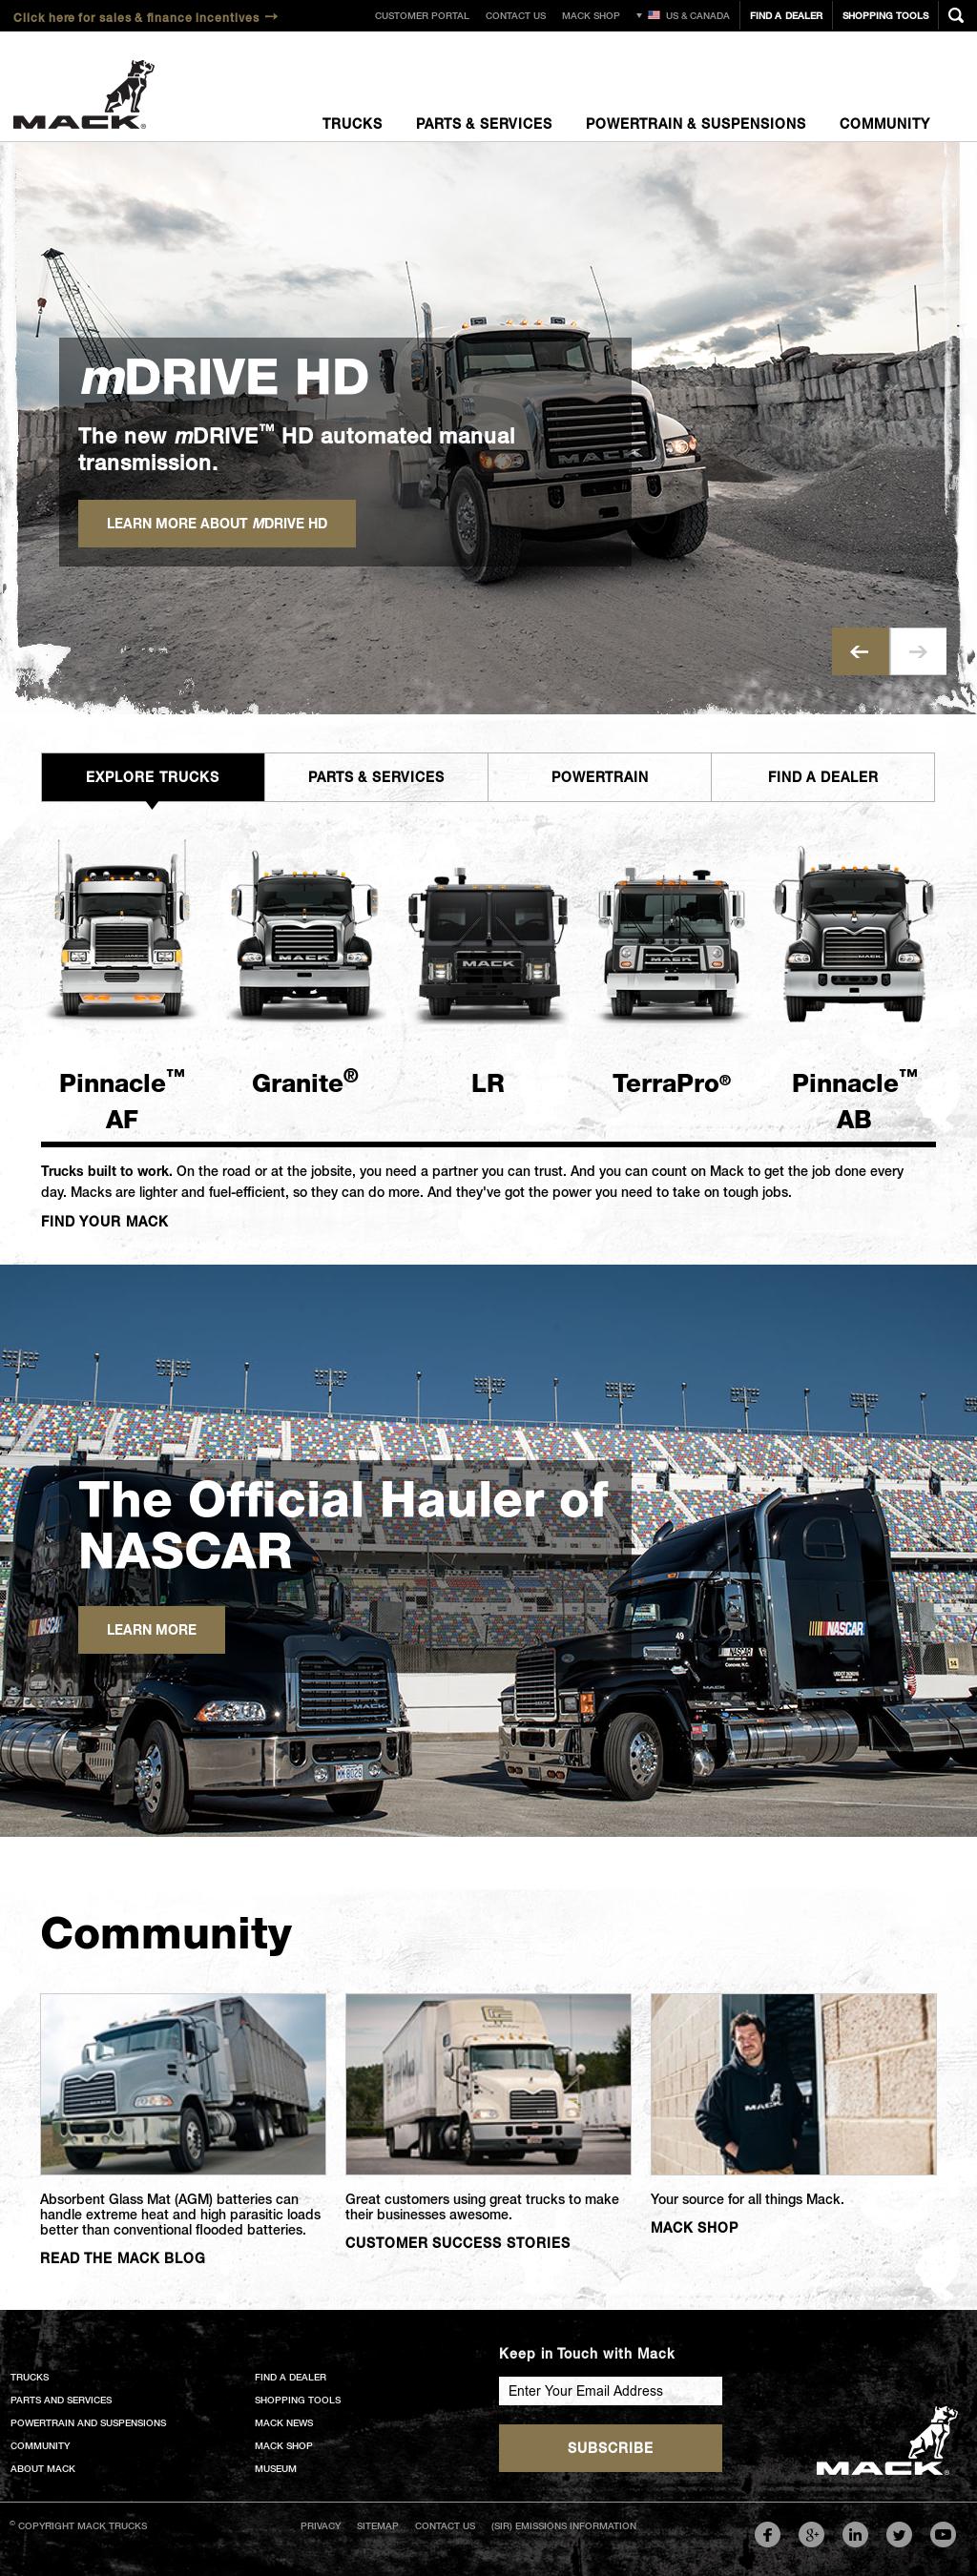 Mack Trucks petitors Revenue and Employees Owler pany Profile